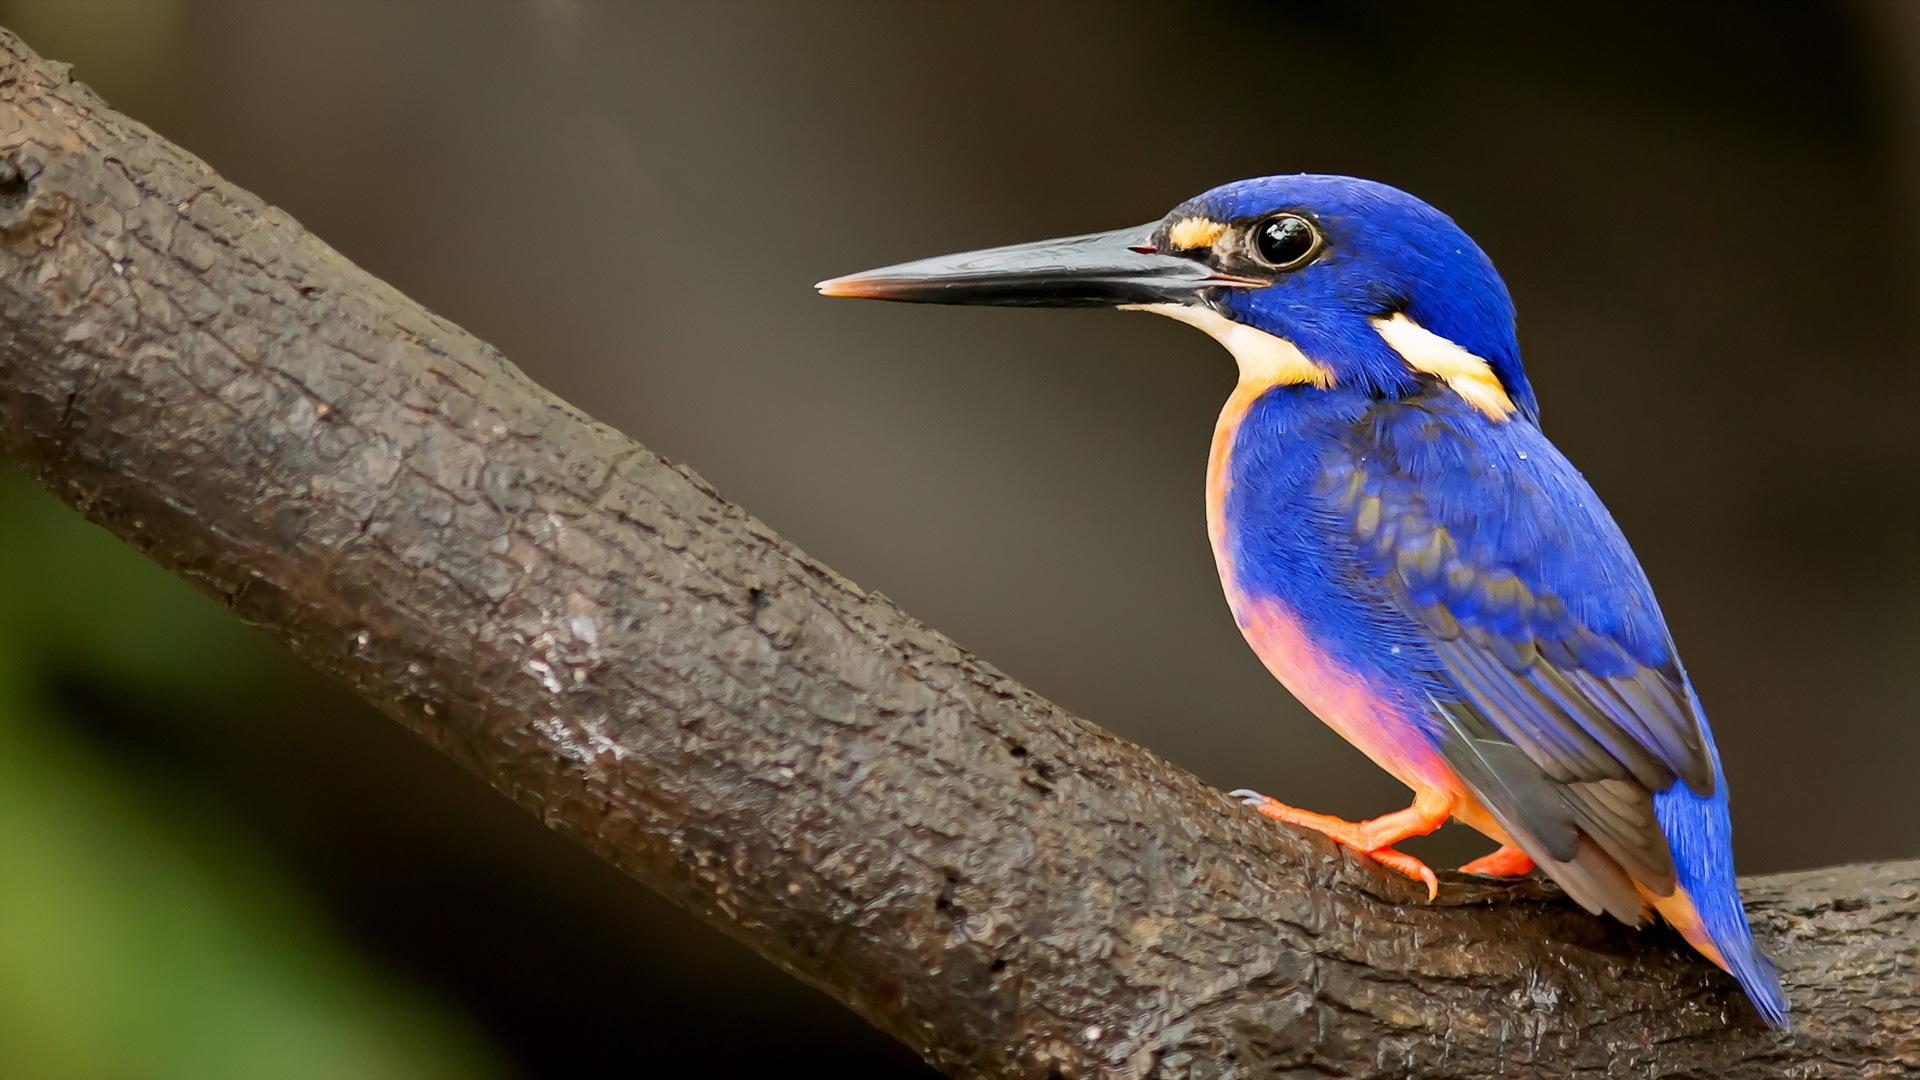 bird with a long beak birds of prey